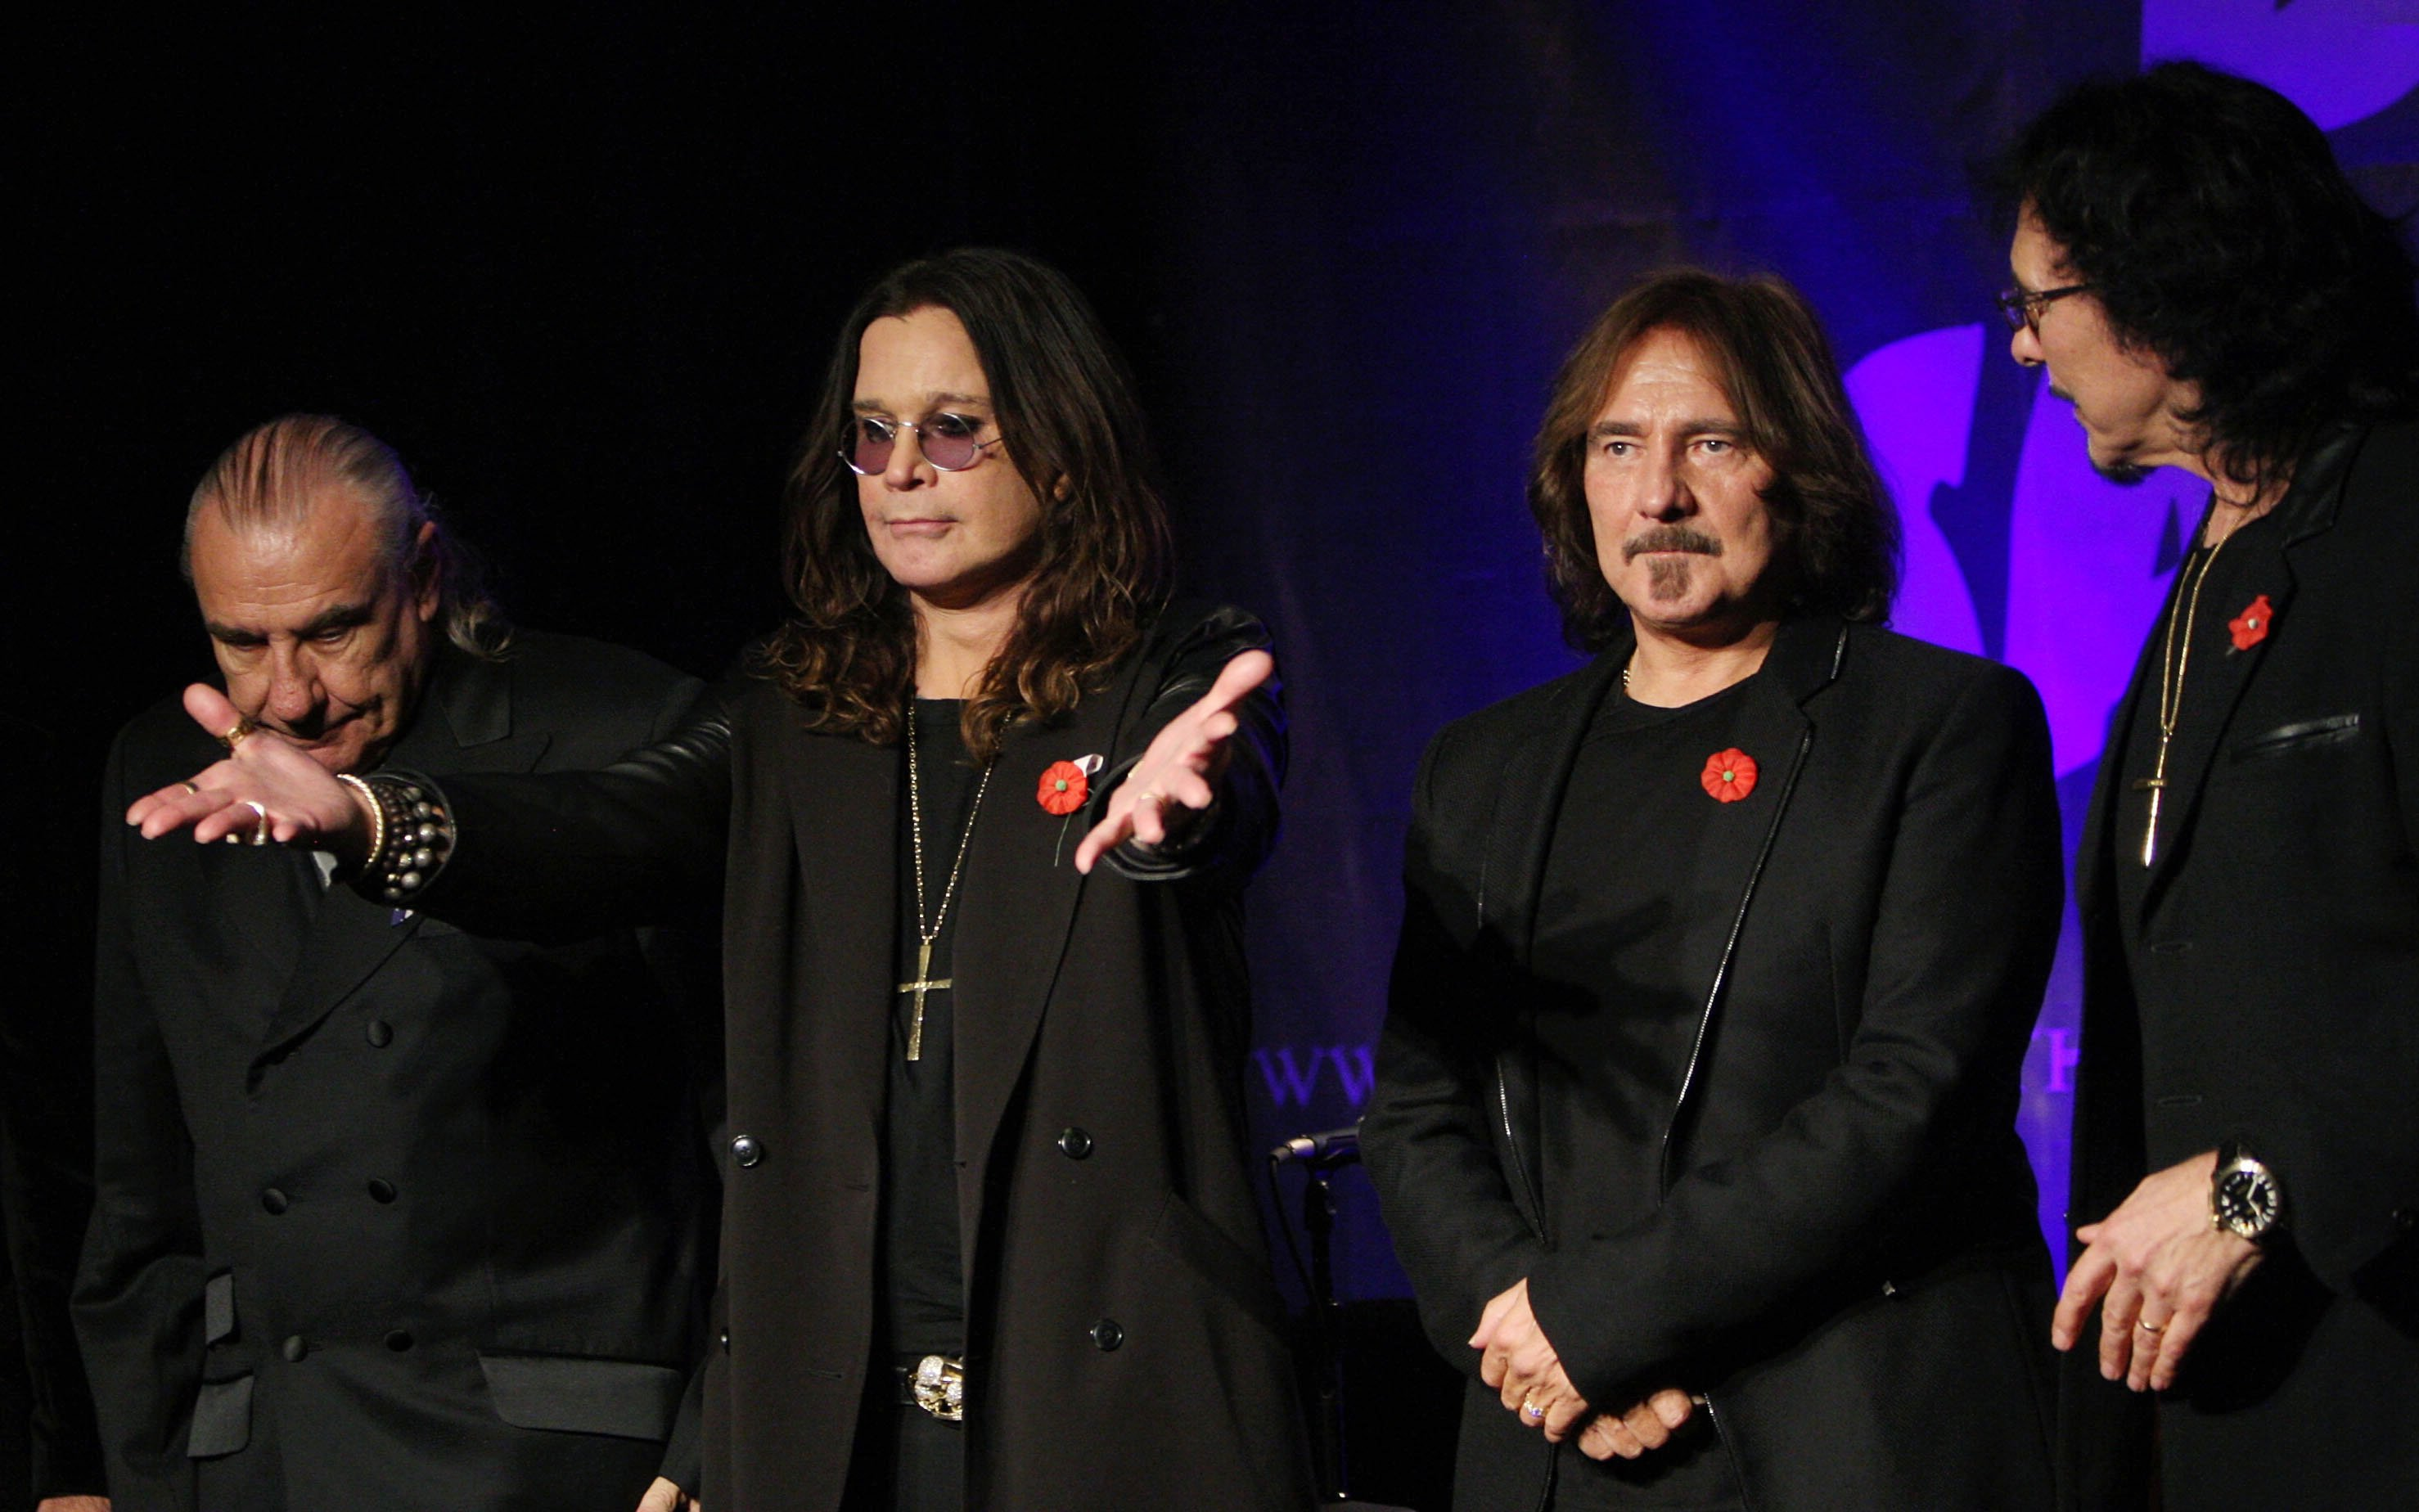 Black Sabbath High Definition Wallpapers